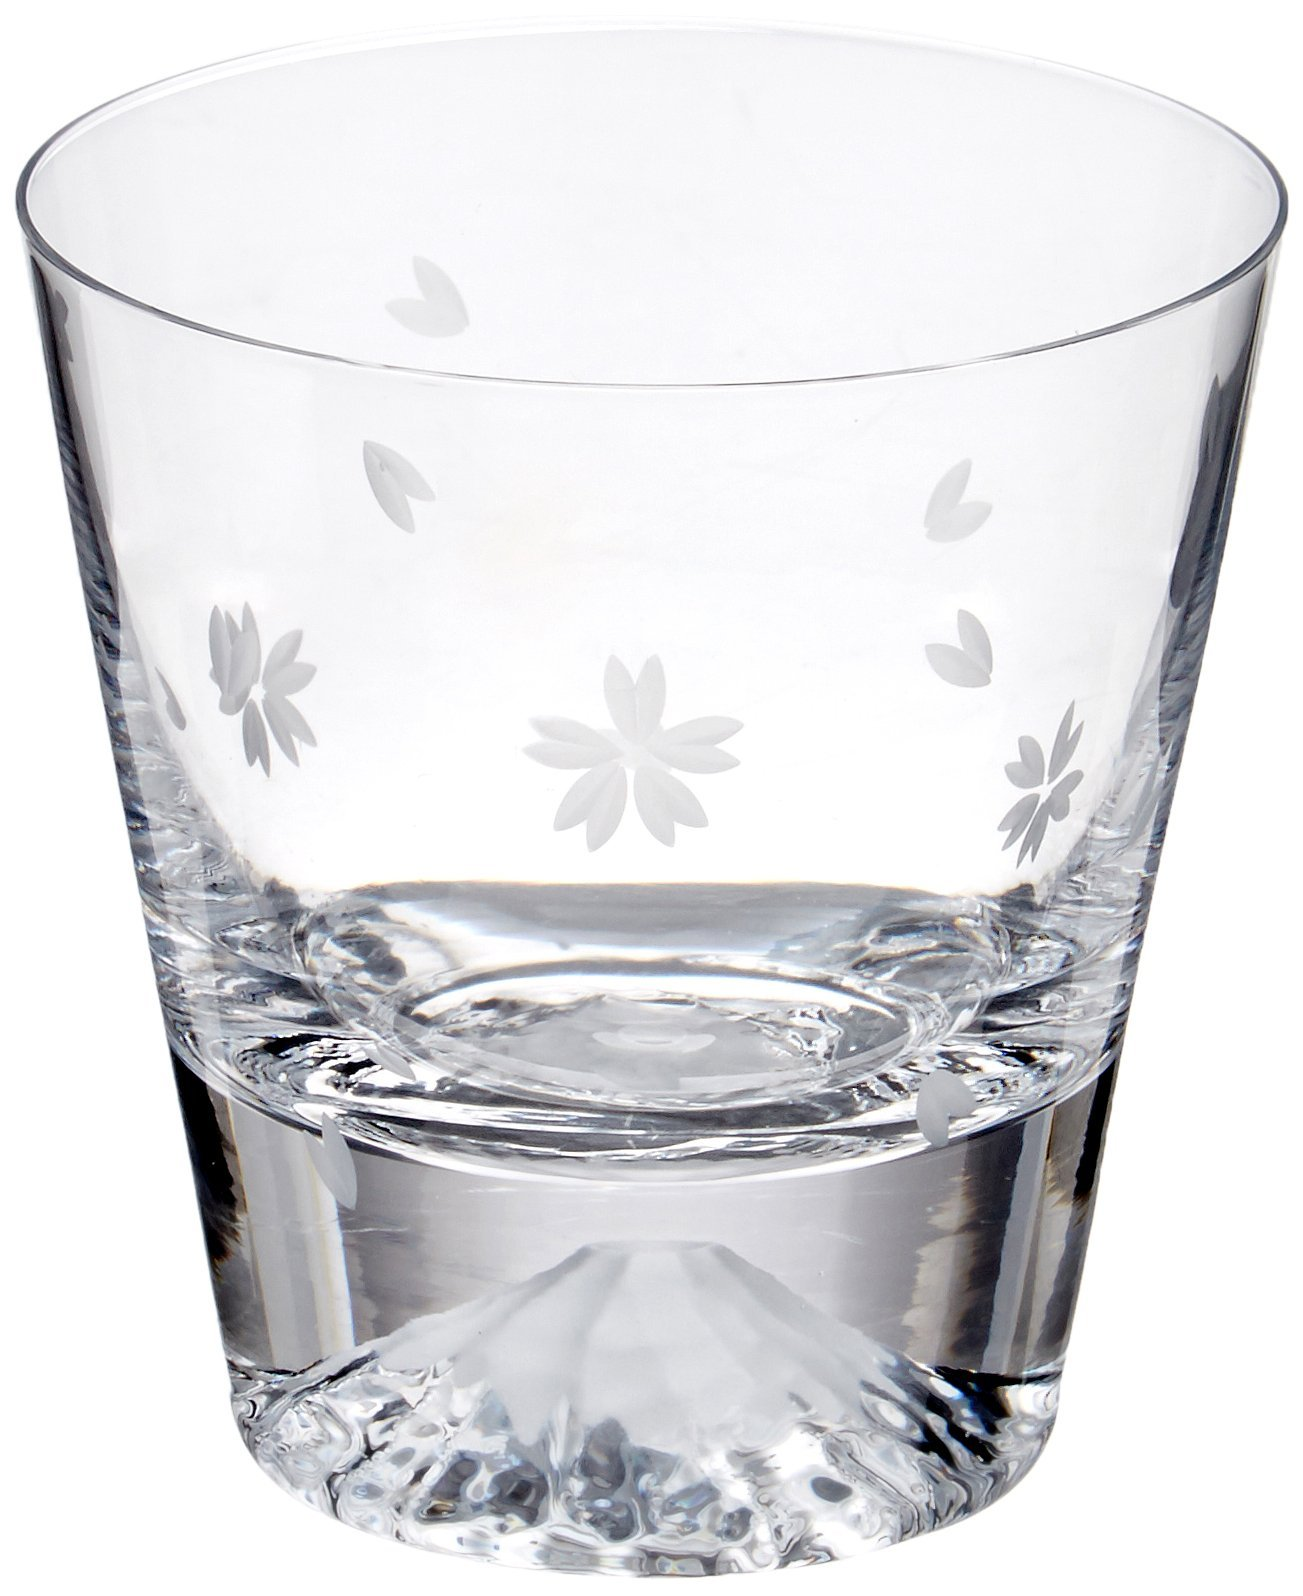 Fujisan Rock Glass Sakura-Fuji TG16-015-RS (Sakura)